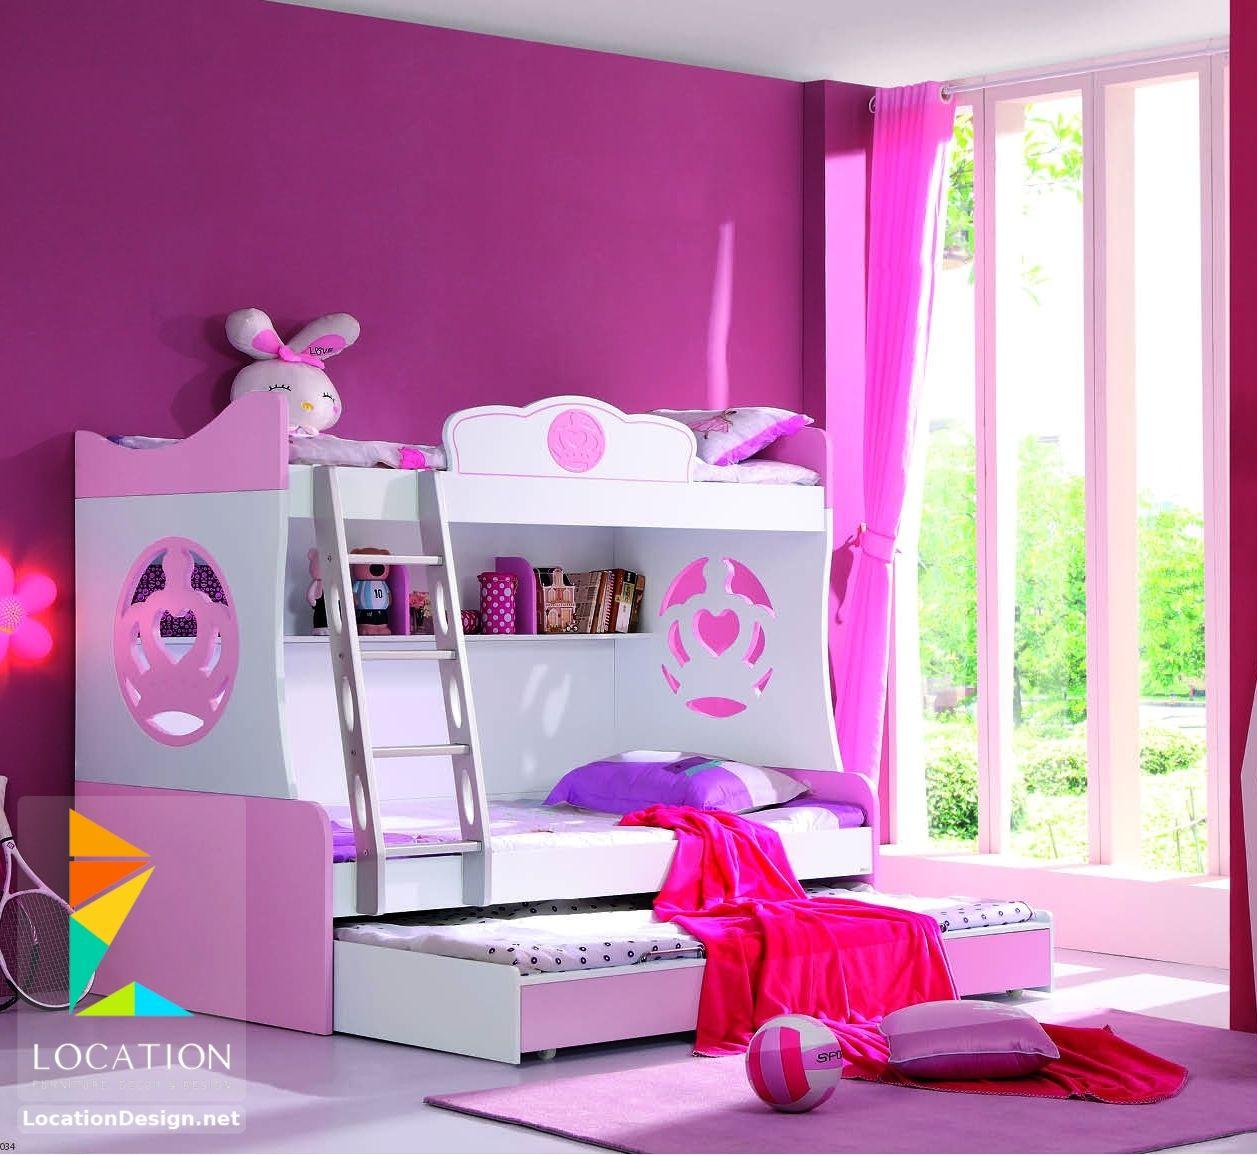 غرف نوم اطفال لشخصين 2018 2019 لوكشين ديزين نت Furniture Toddler Bed Room